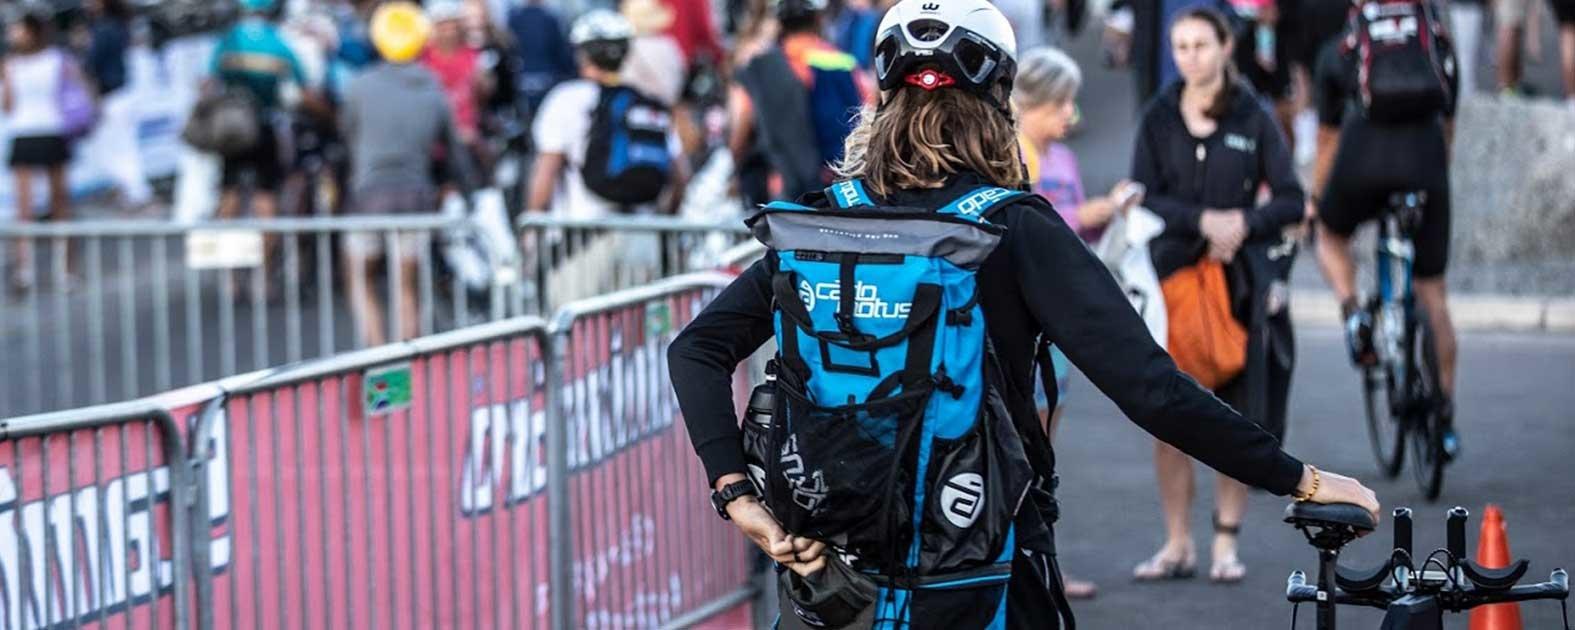 Jamie Riddle Pro Triathlete with Cadomotus helmet and backpack